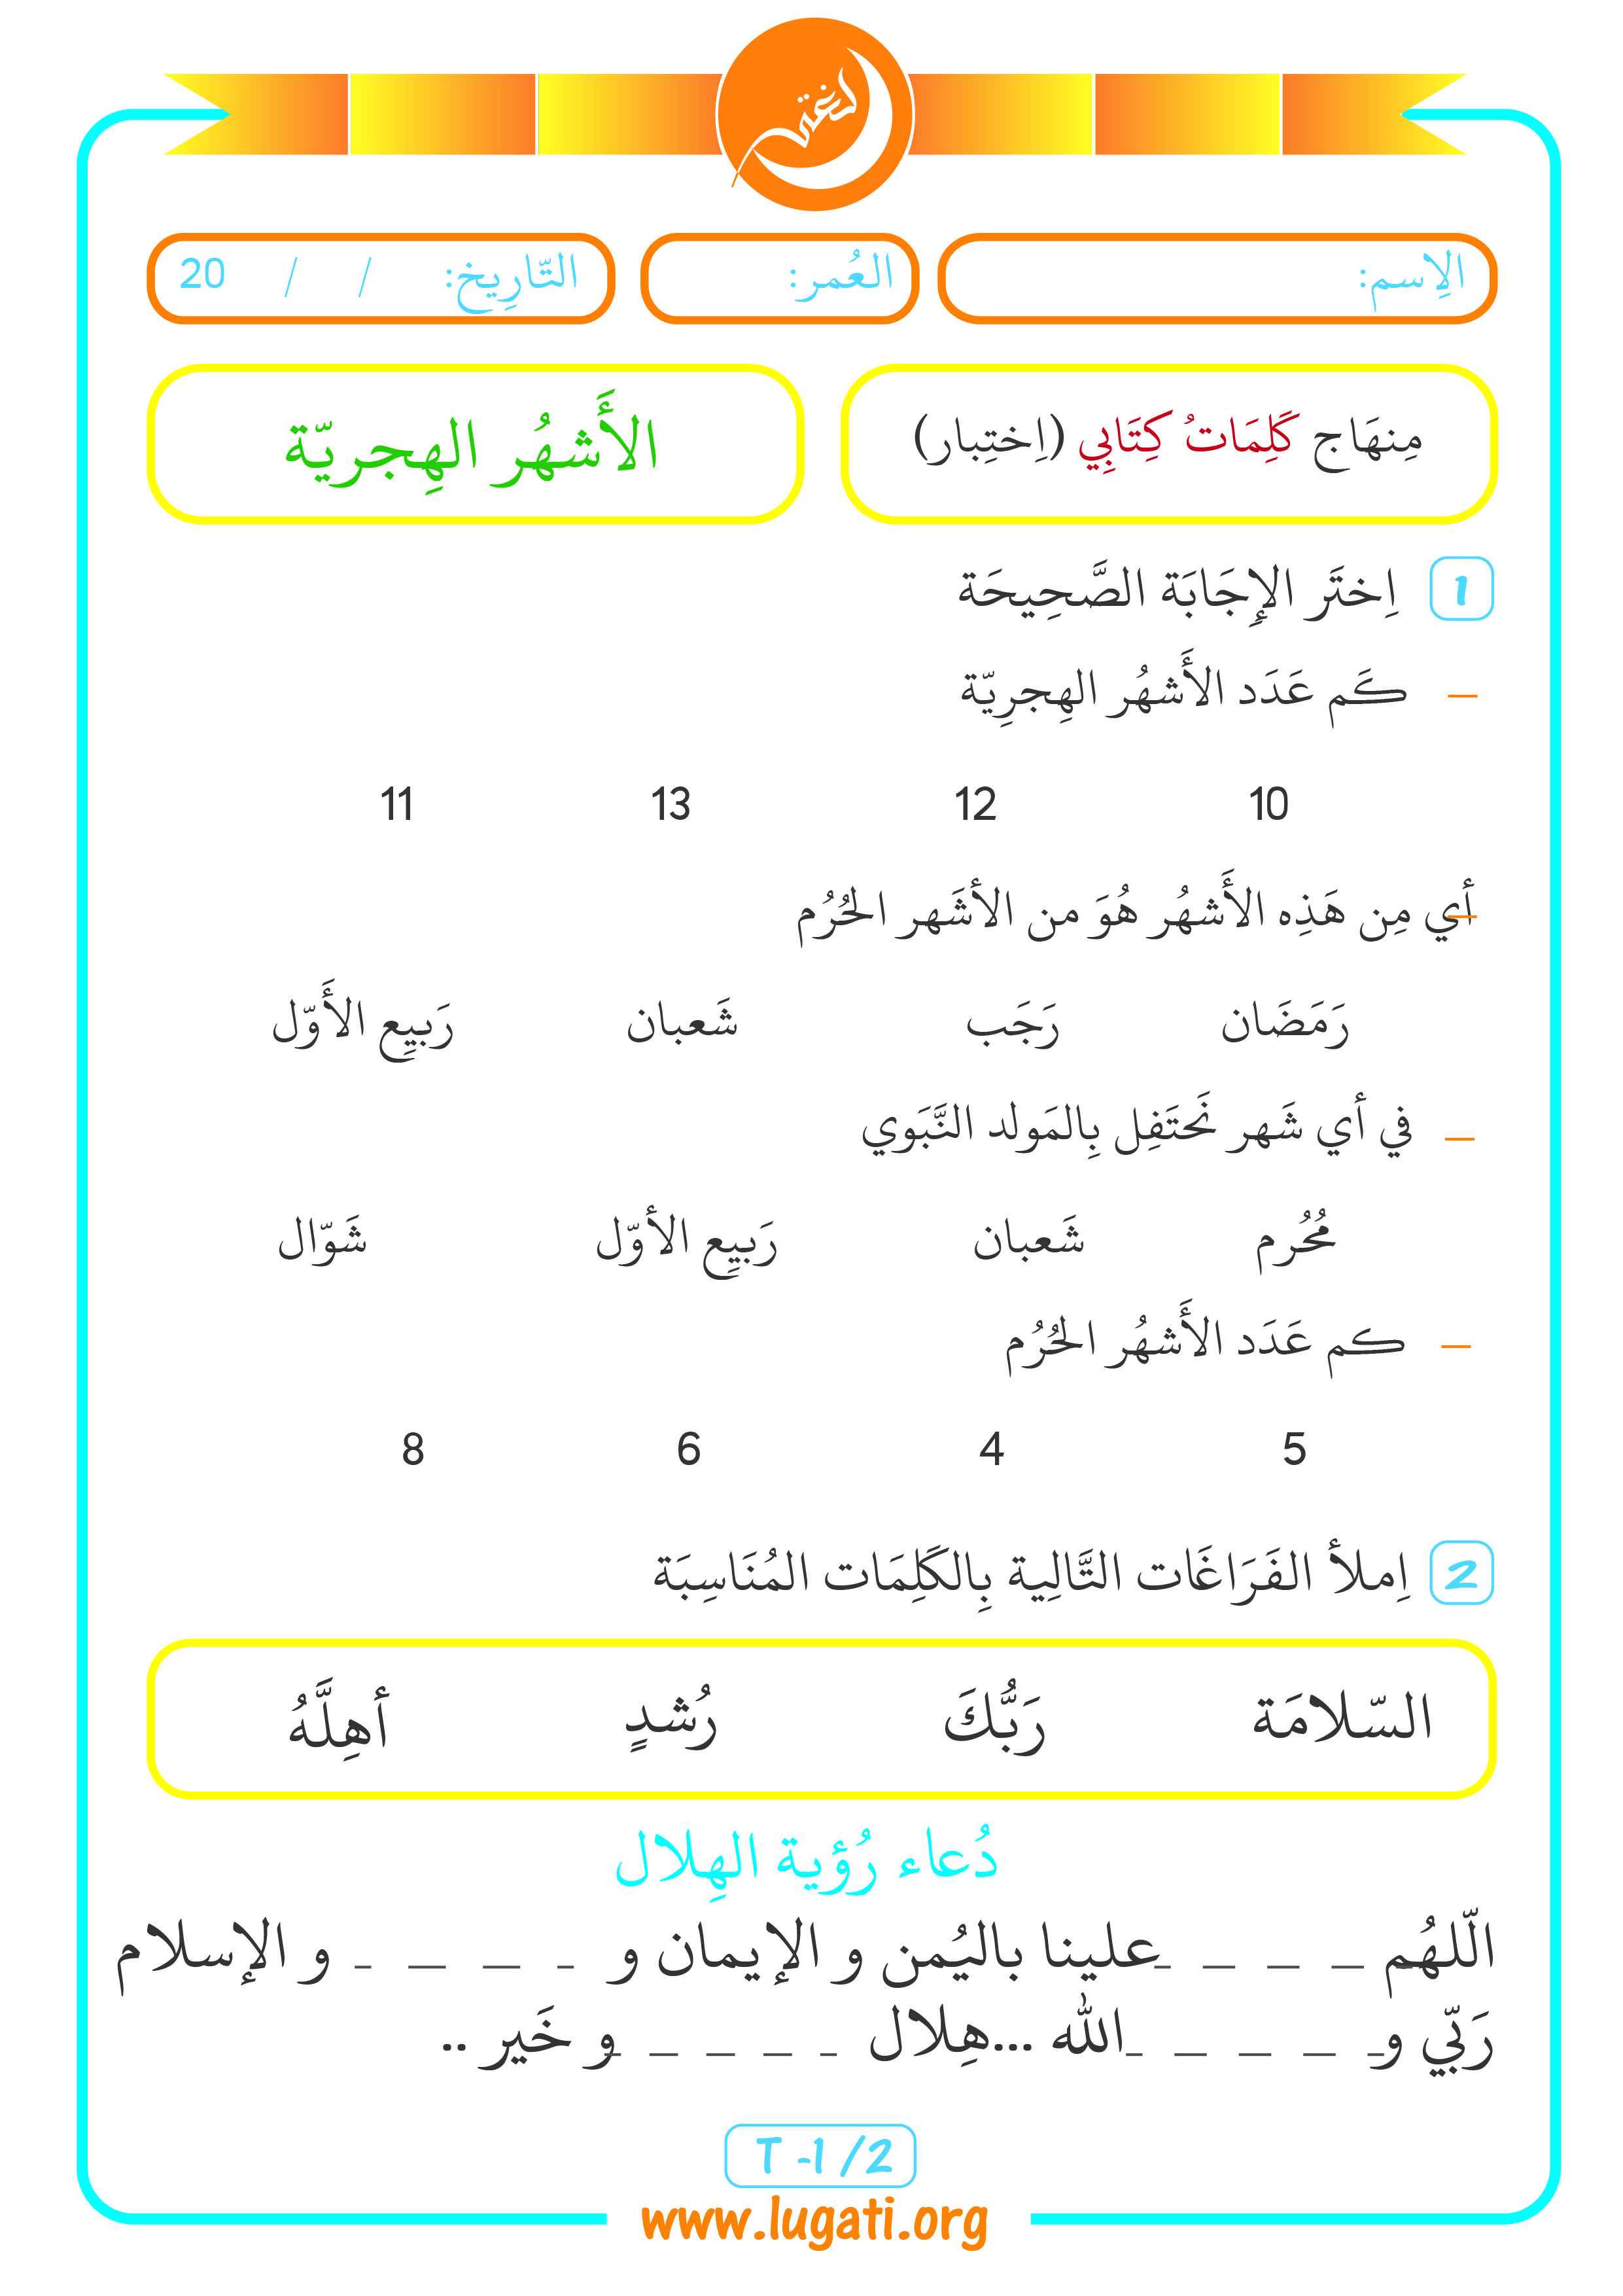 Hijri Months T1 Arabic Alphabet For Kids Arabic Kids